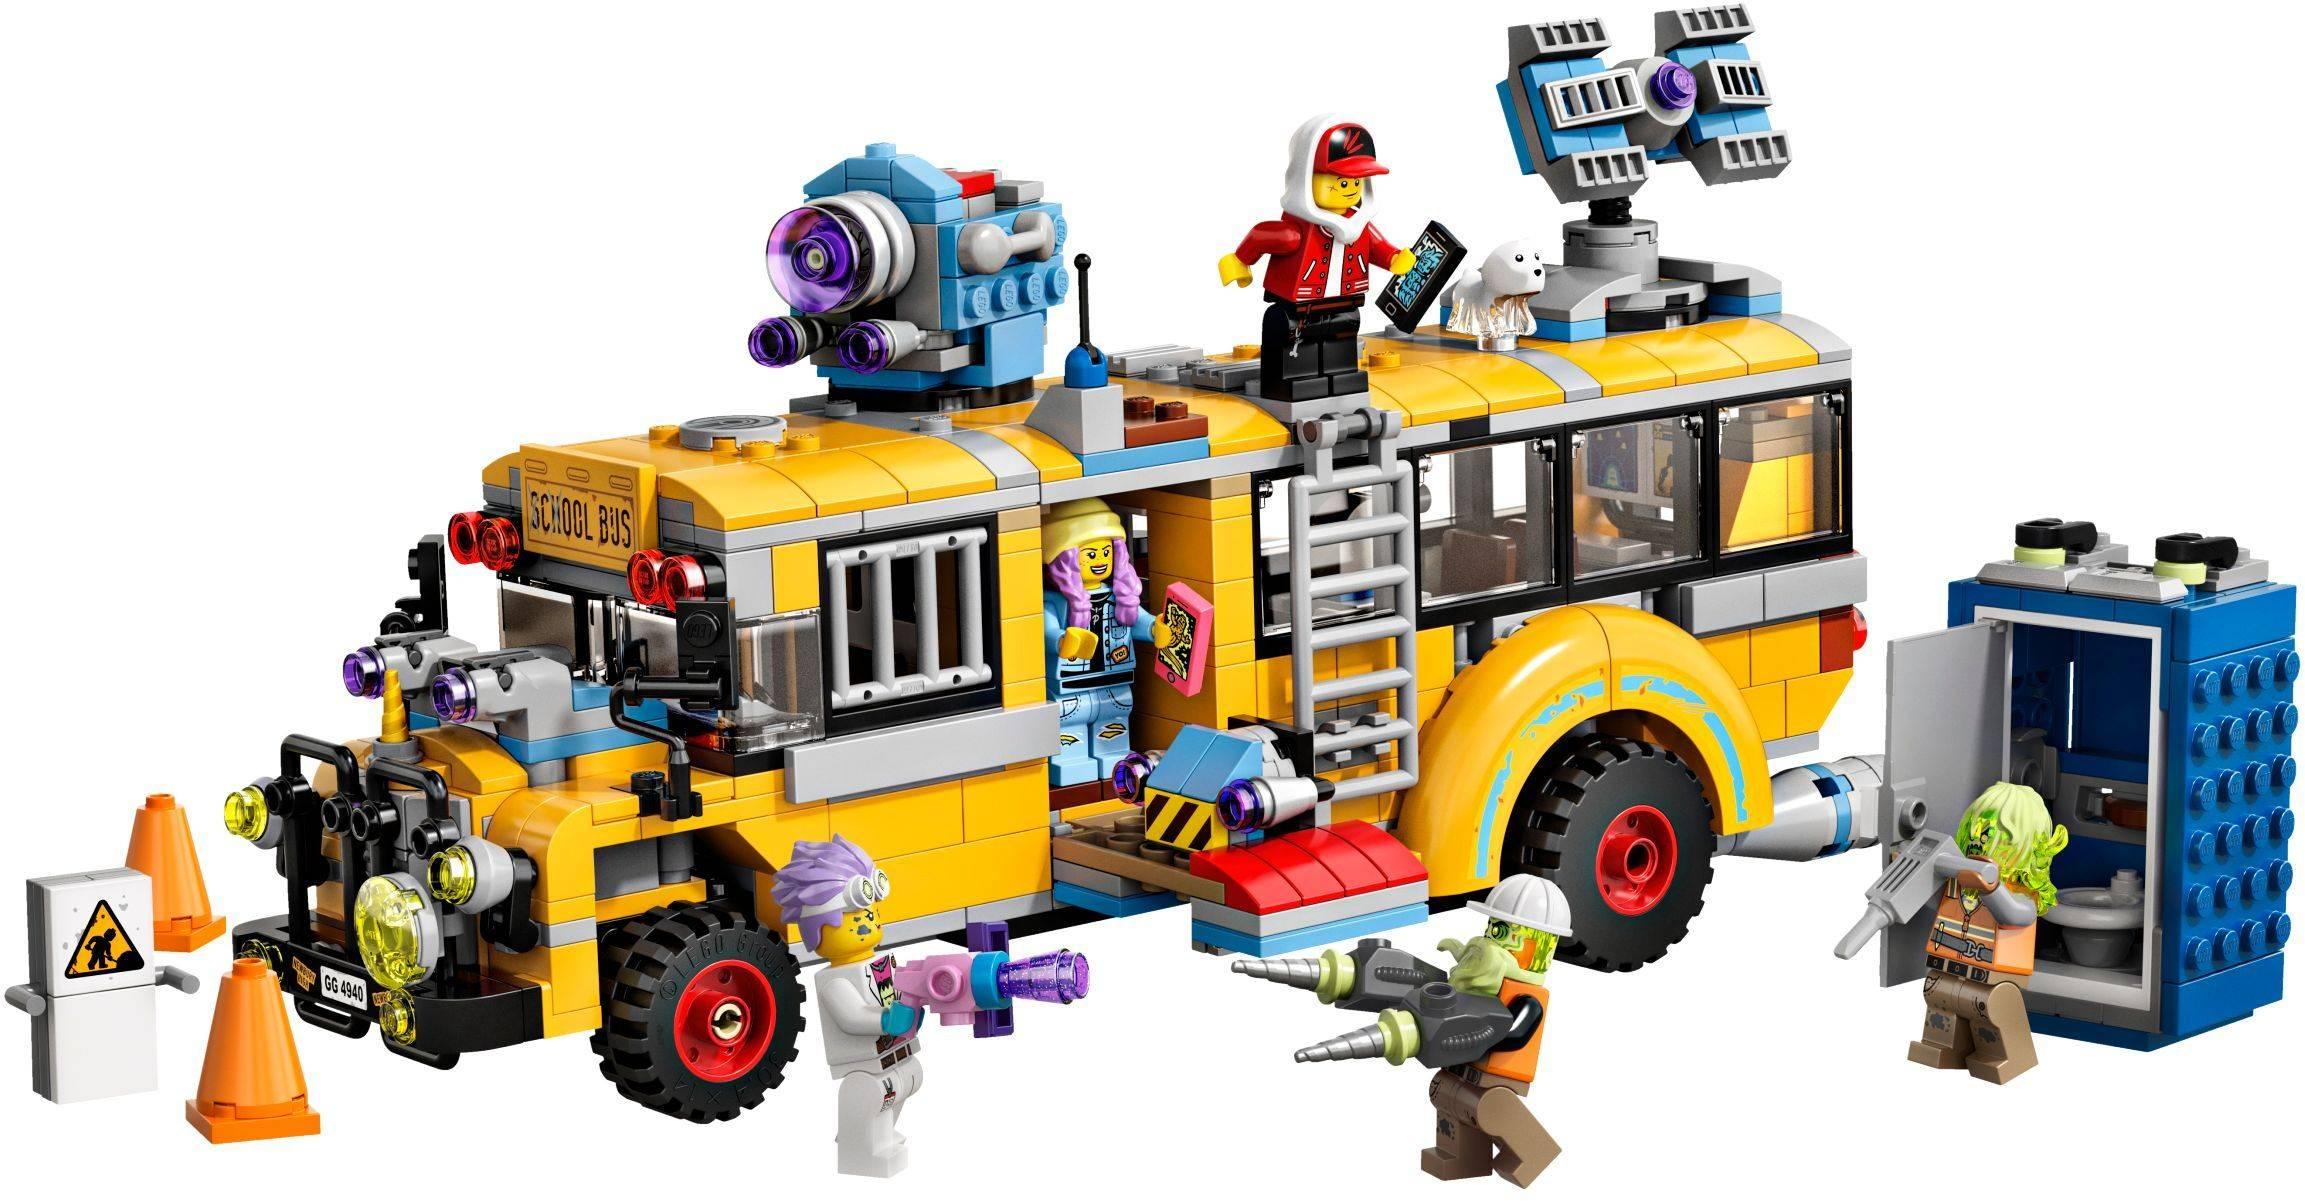 70423-1 Paranormal Intercept Bus 3000